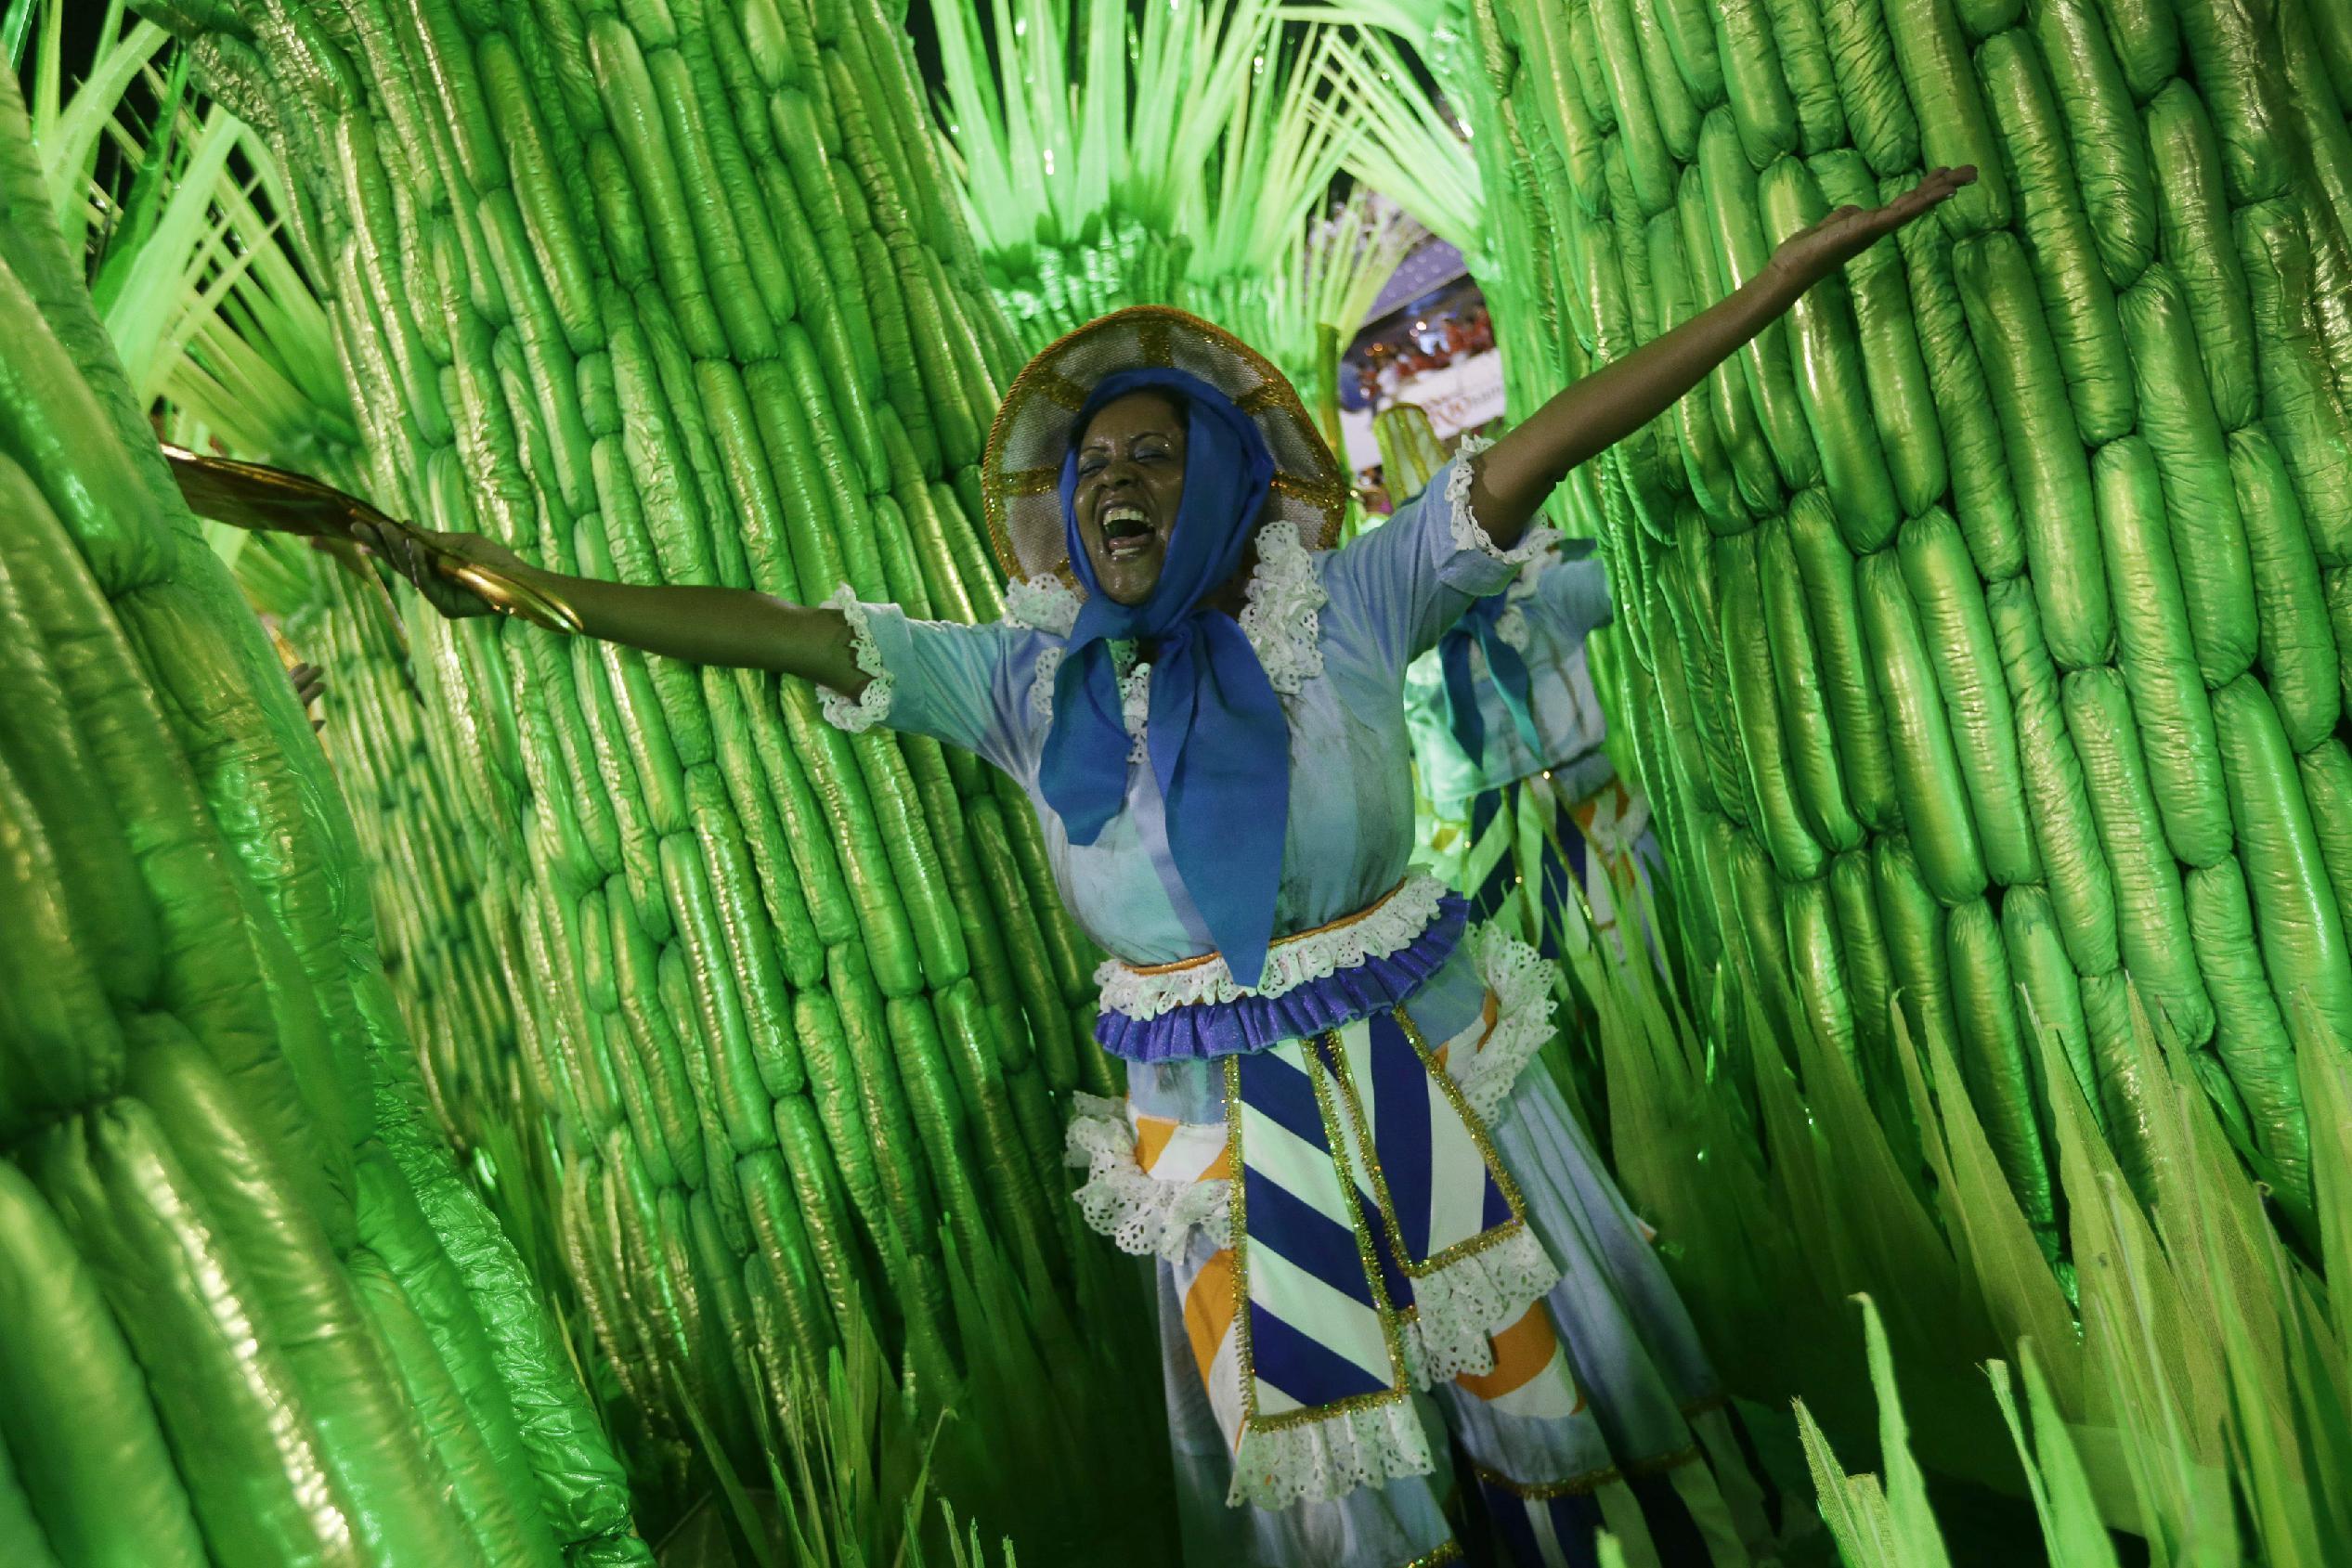 rio de janeiro's samba schools vie for title